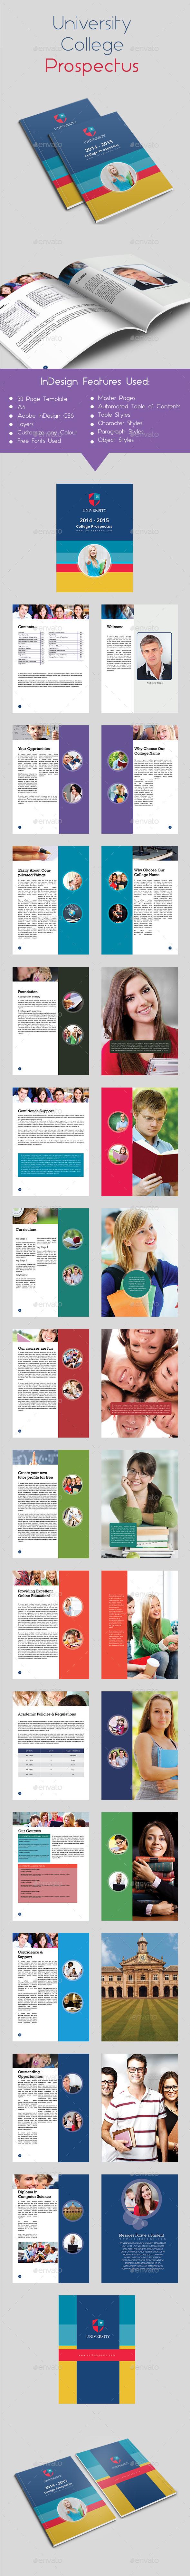 University College Prospectus - Brochures Print Templates